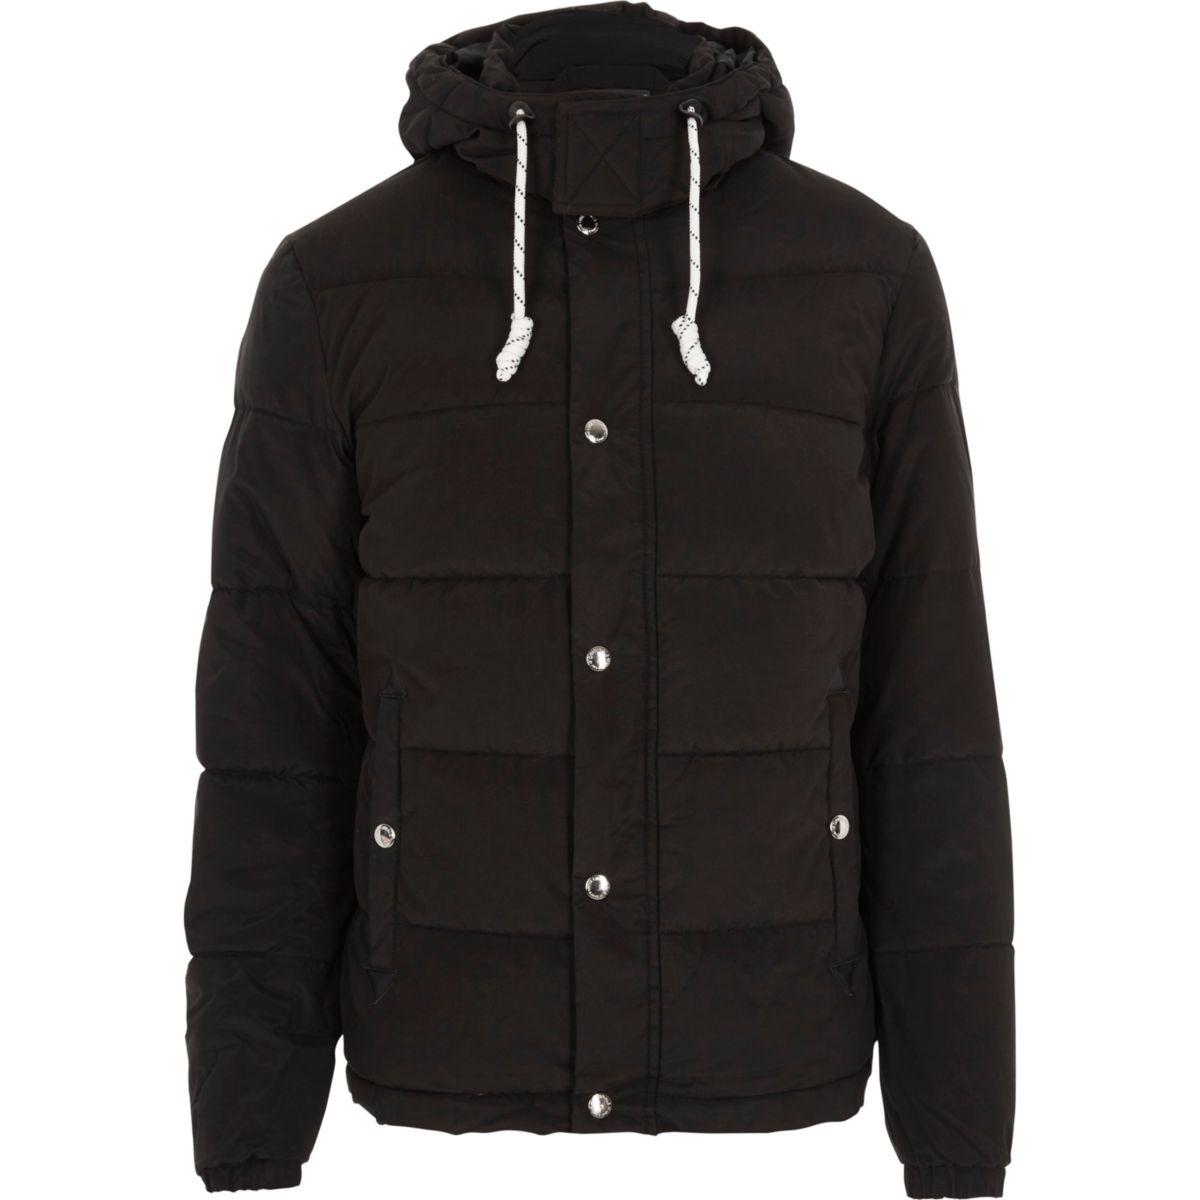 Black Jack & Jones hooded puffer jacket